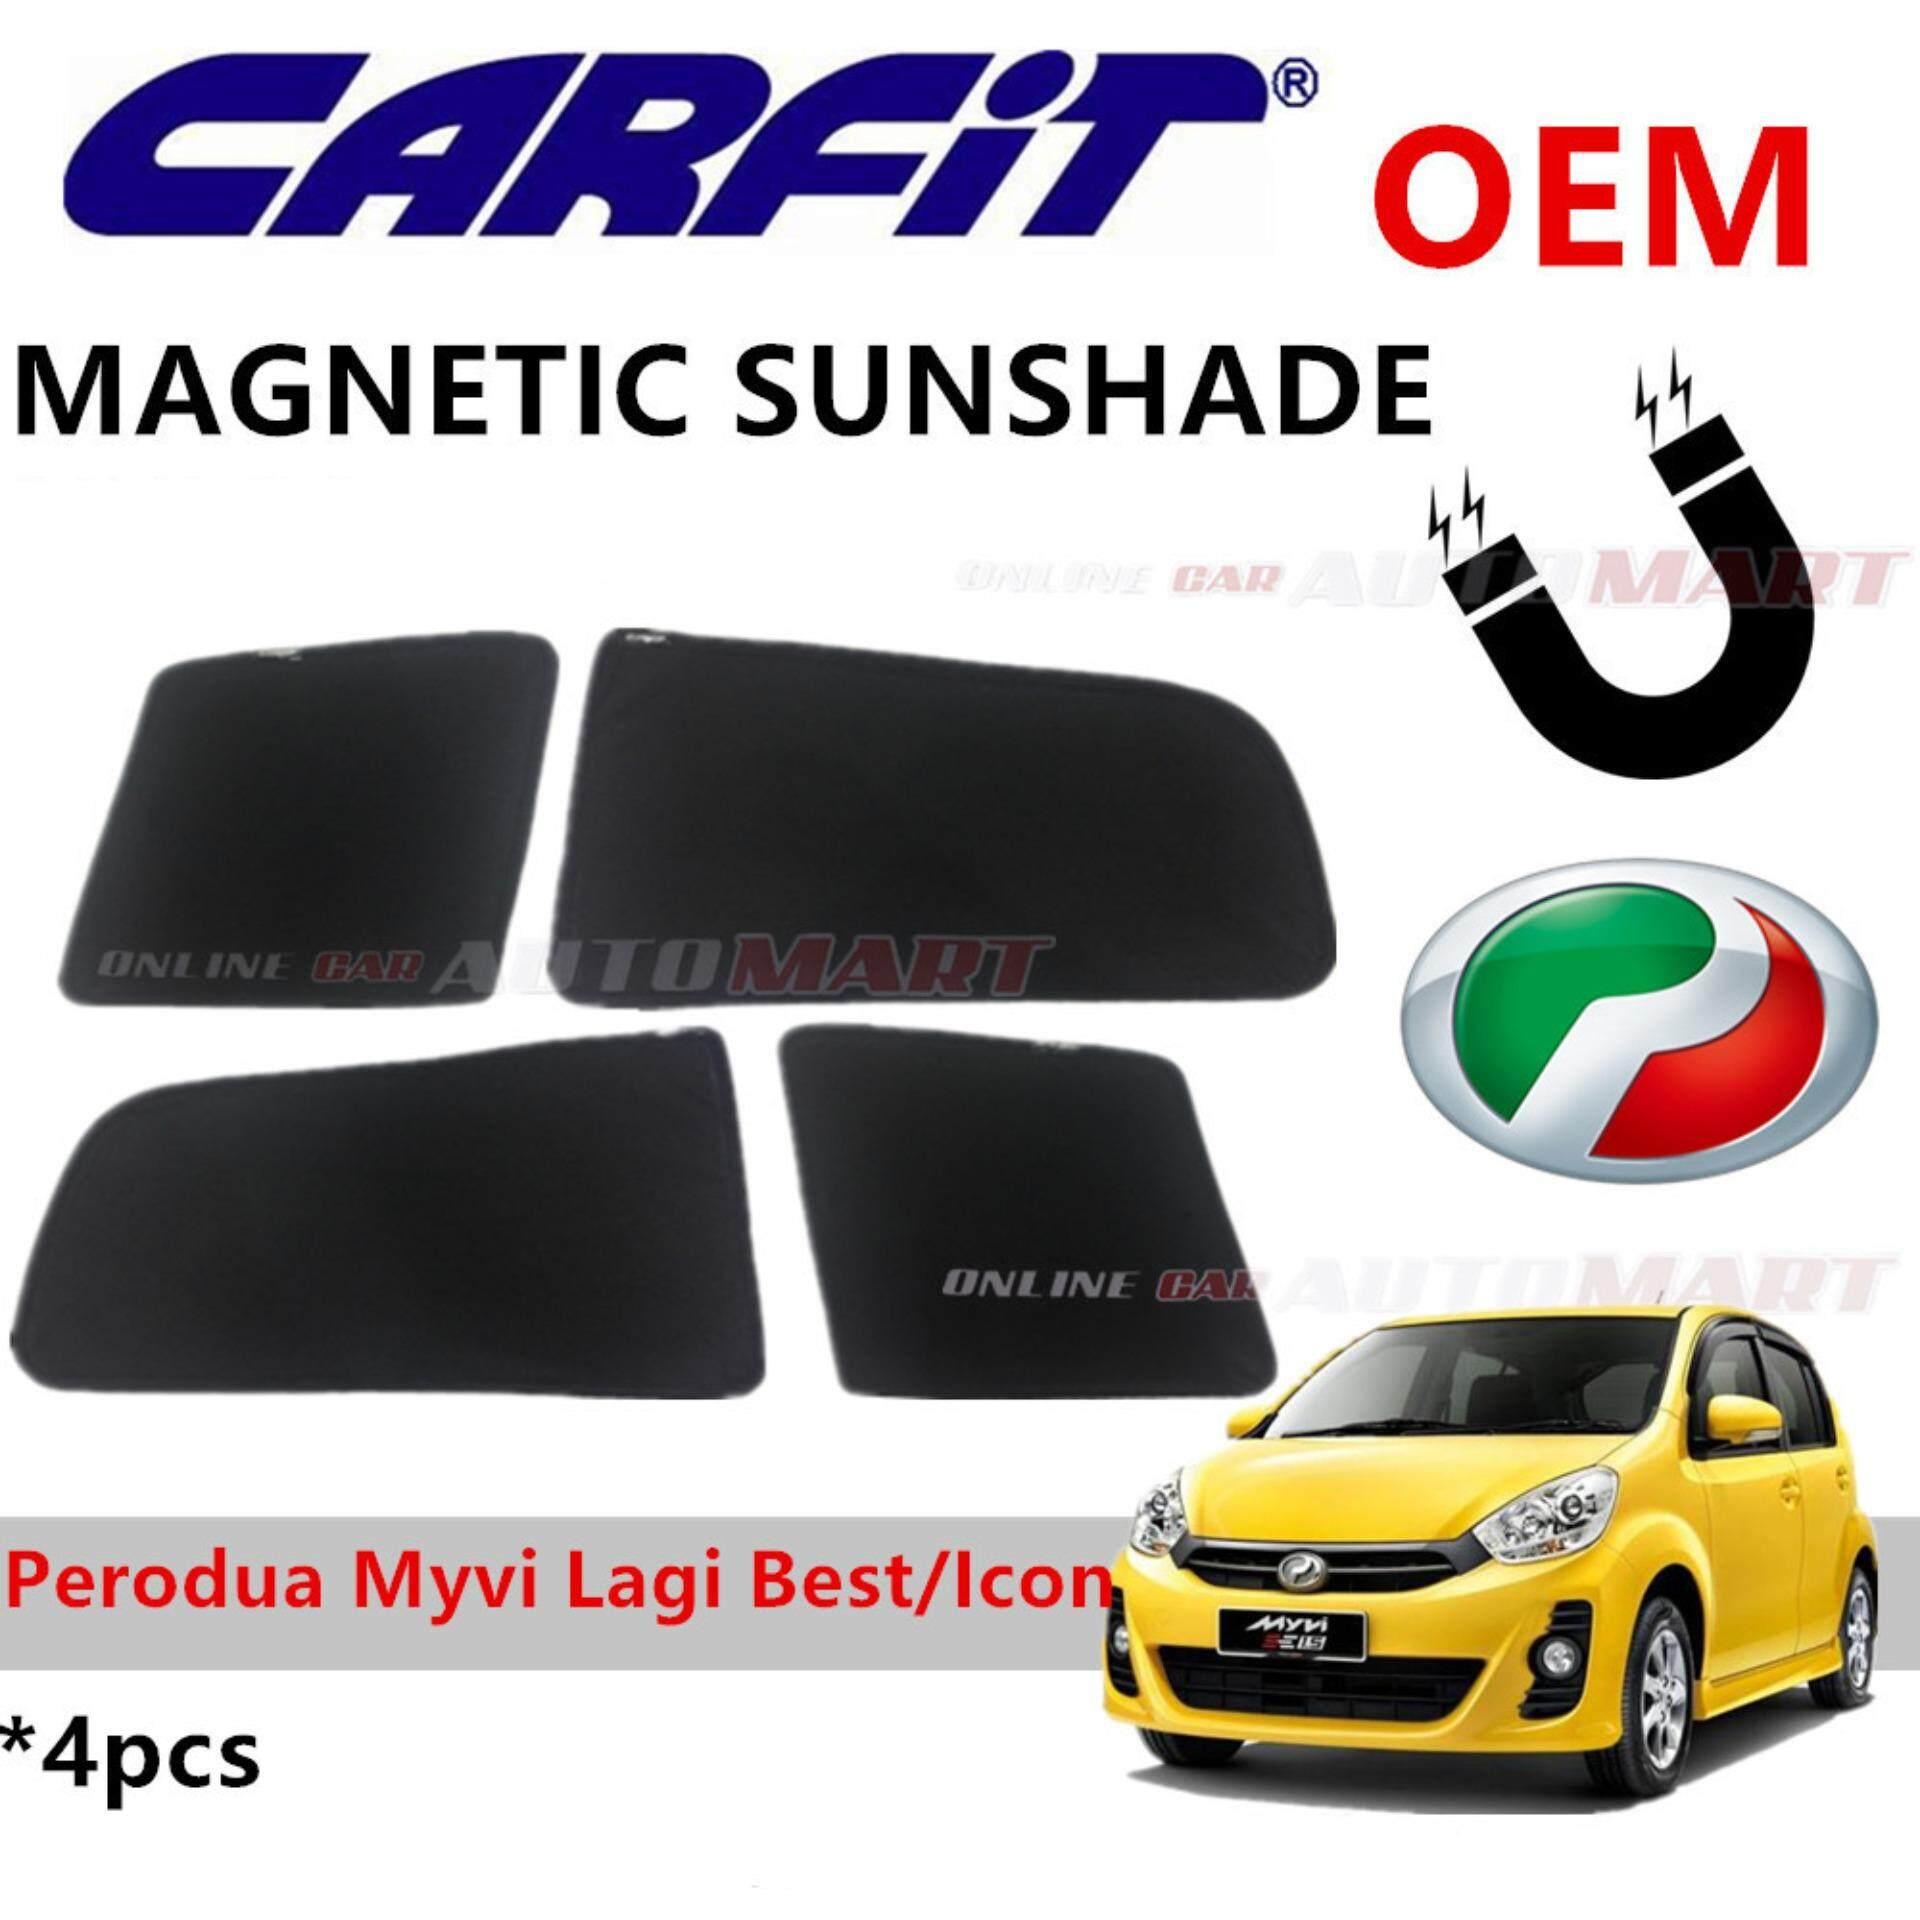 CARFIT OEM Magnetic Custom Fit Sunshade For Perodua Myvi Lagi Best/Icon (4pcs Sets)